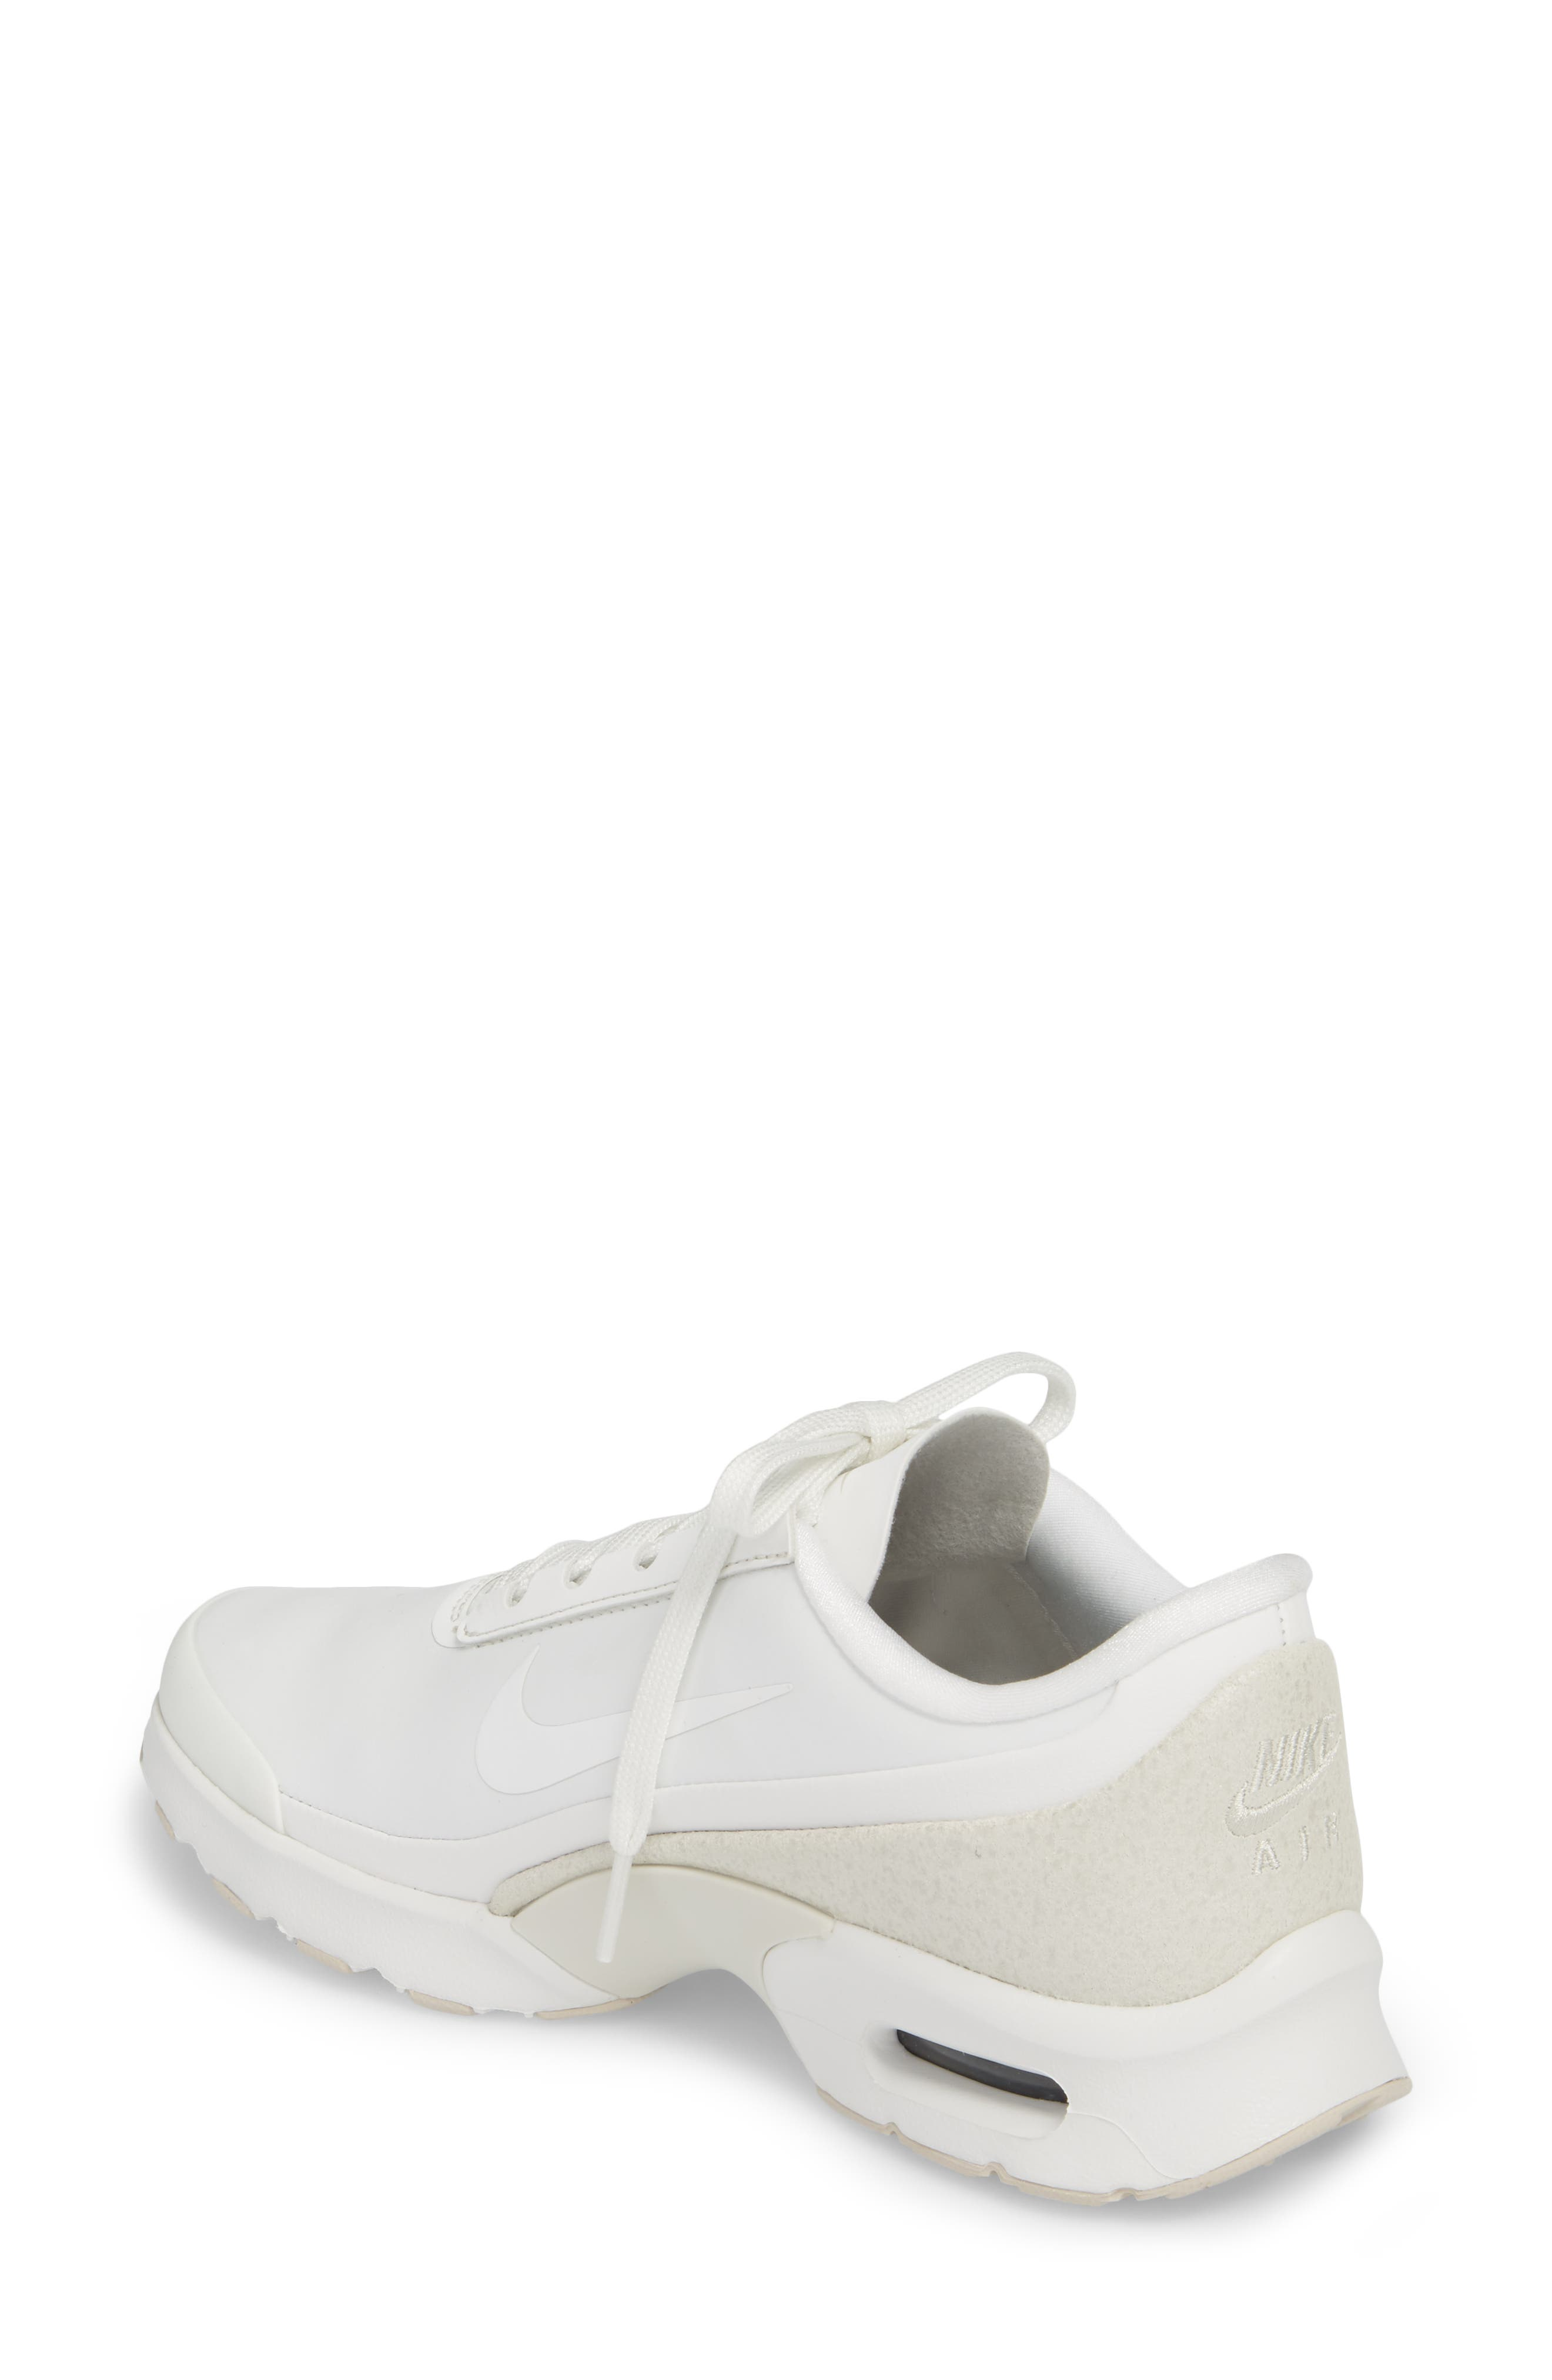 Air Max Jewell Sneaker,                             Alternate thumbnail 2, color,                             100